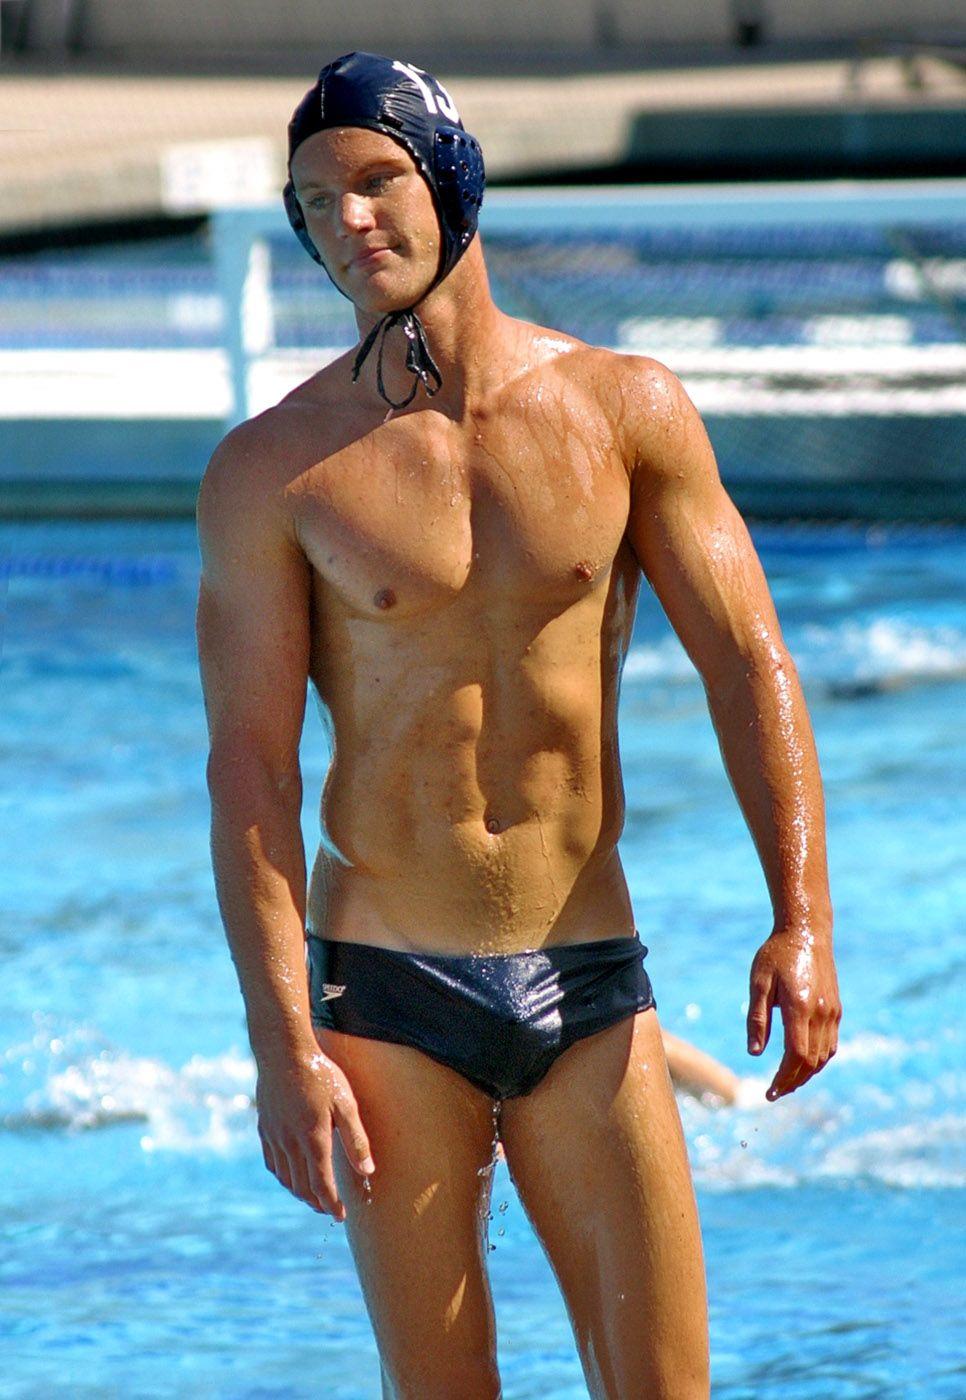 Swim Fever 2 Speedo Smooth Tan Muscles Water Polo Water Polo Speedo Water Polo Players